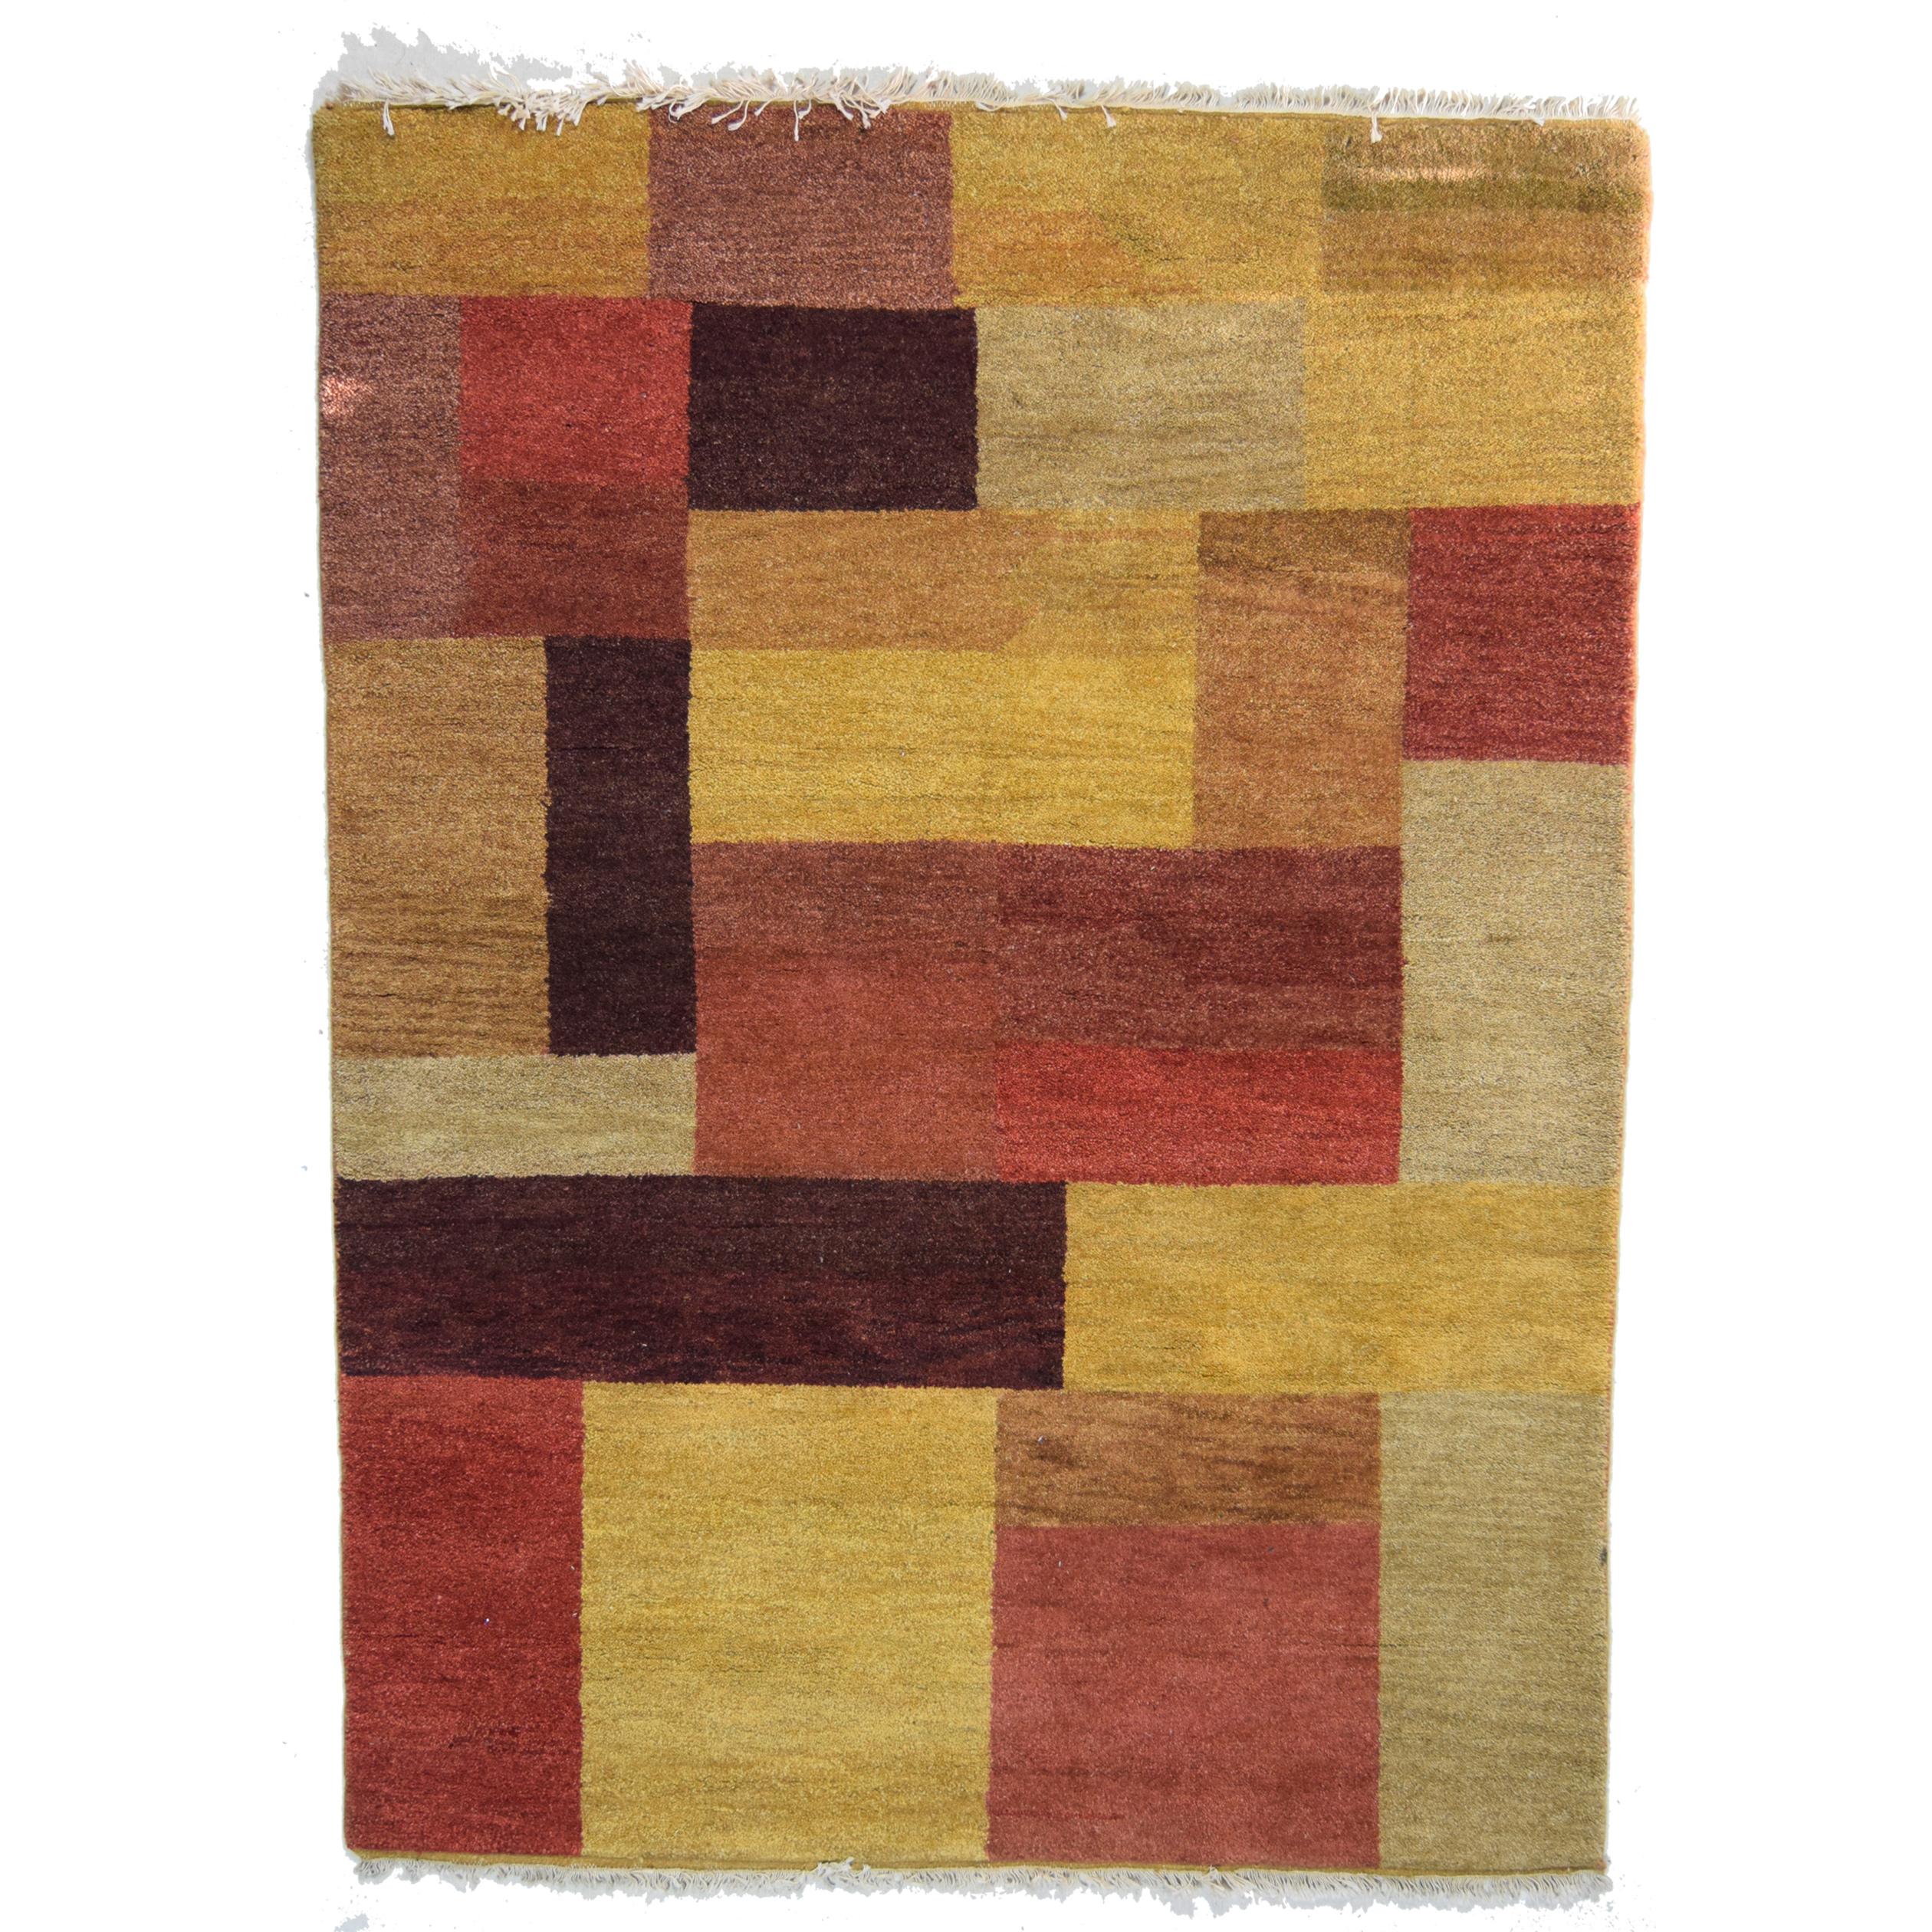 Modern Rugs :: Handloom Carpet 200x147cm INDIAN WOOLLEN